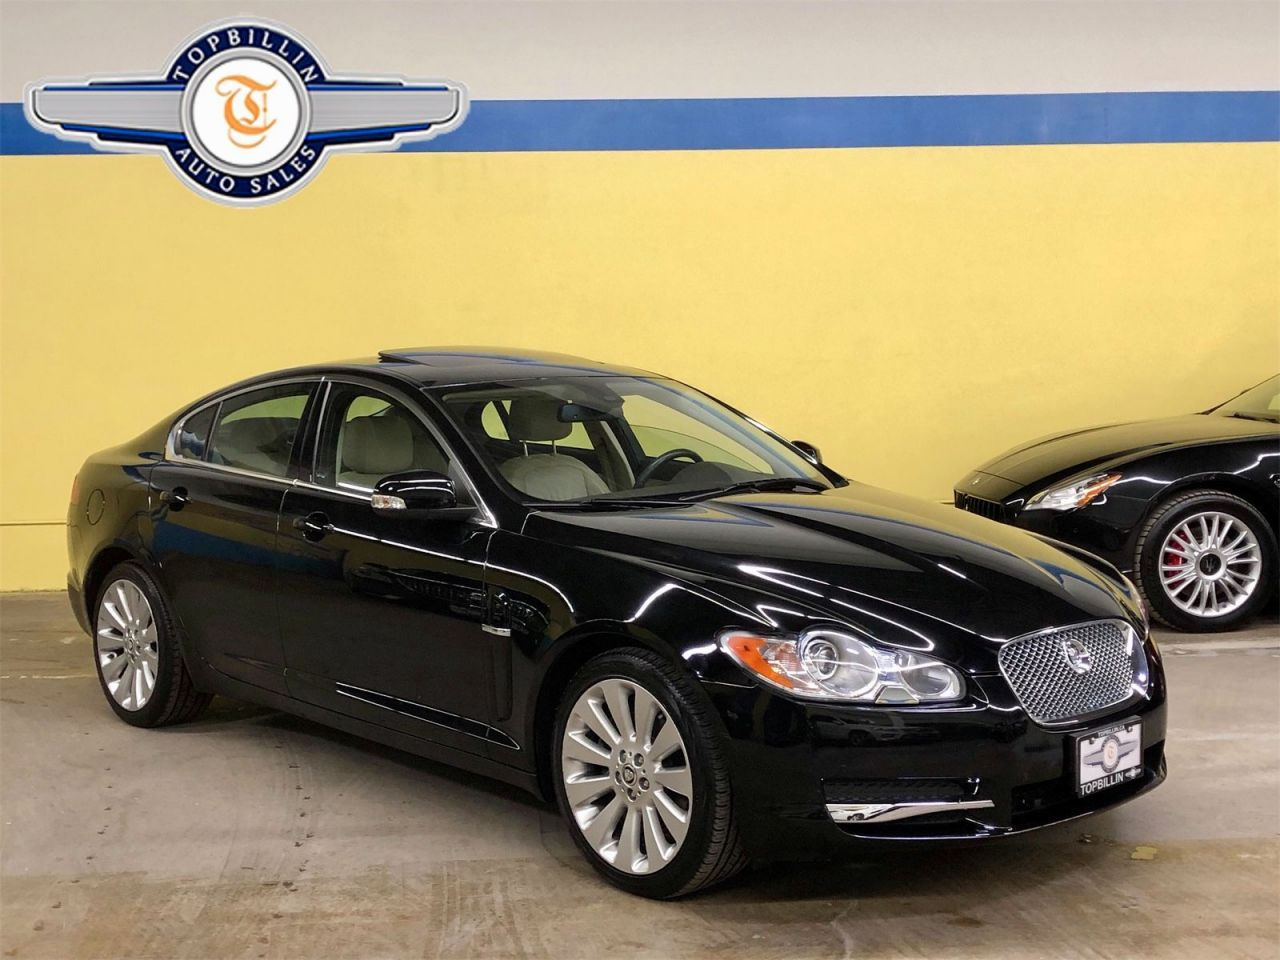 2009 Jaguar XF Premium Luxury, Navi, Blind spot, B Cam